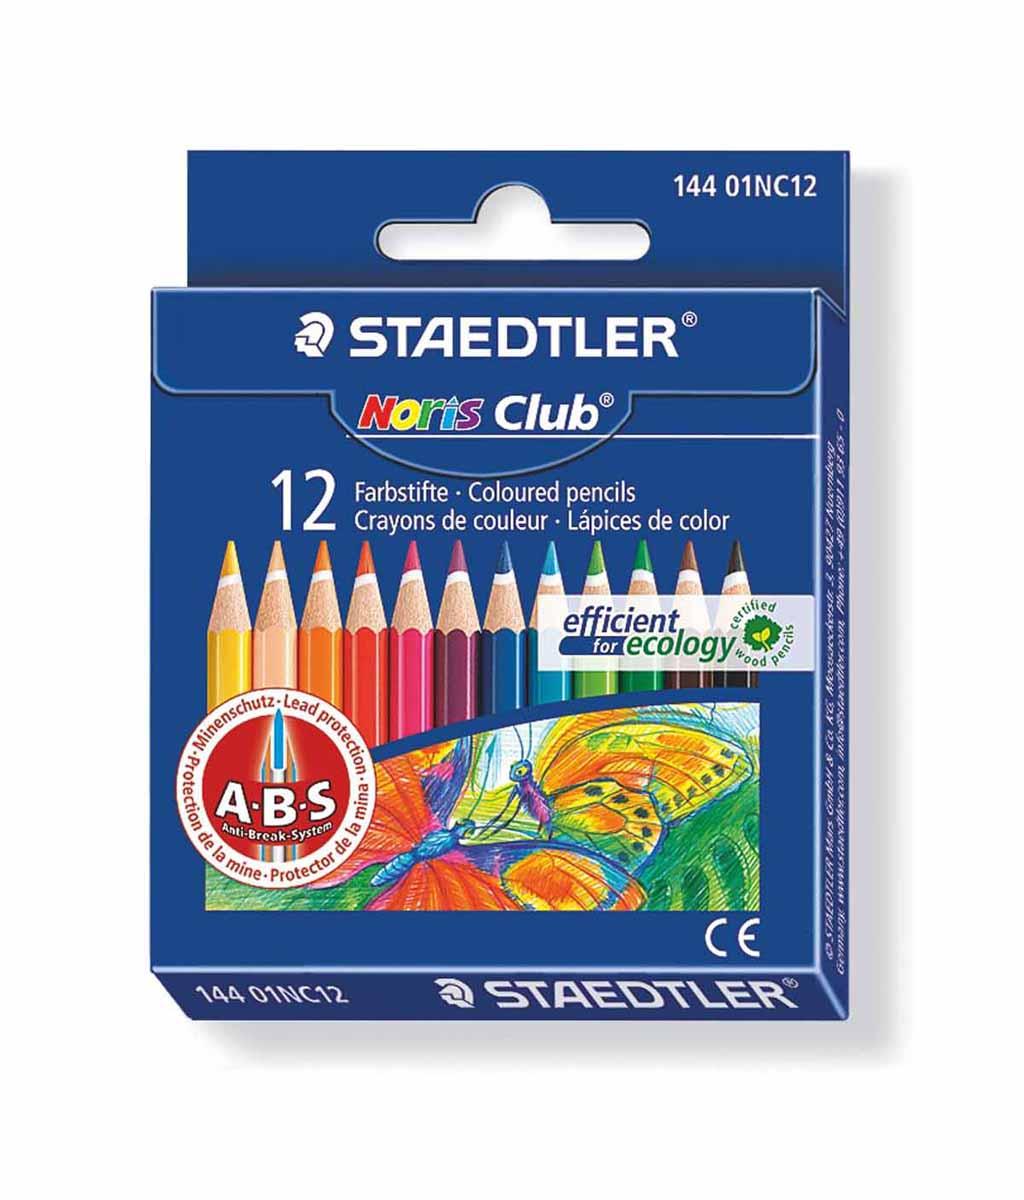 Staedtler Набор цветных карандашей Noris Club 144 12 цветов staedtler staedtler цветные карандаши noris club class pack 12 цветов